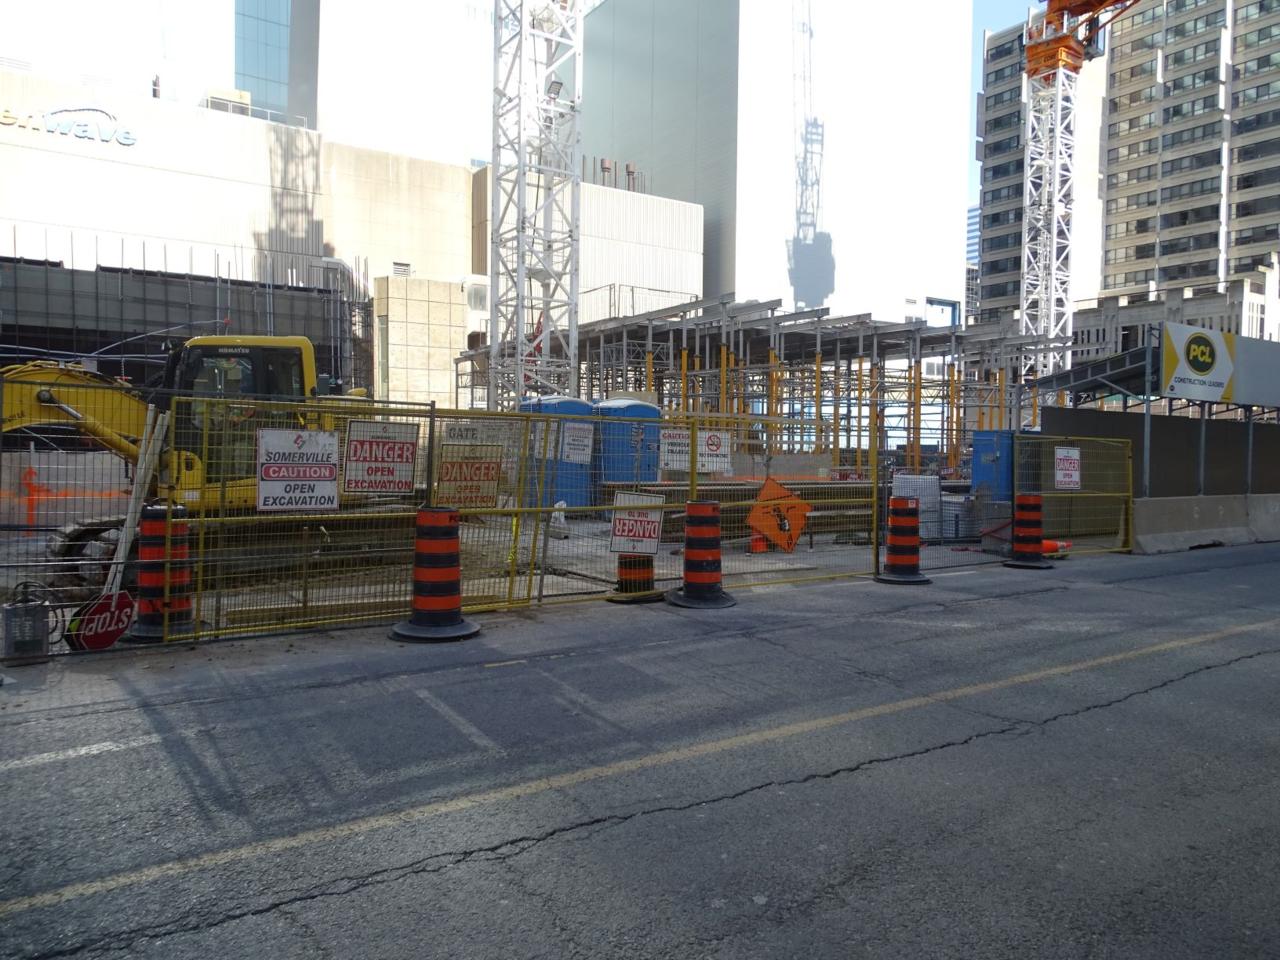 SickKids Patient Support Centre, B+H Architects, Toronto, Project Horizon